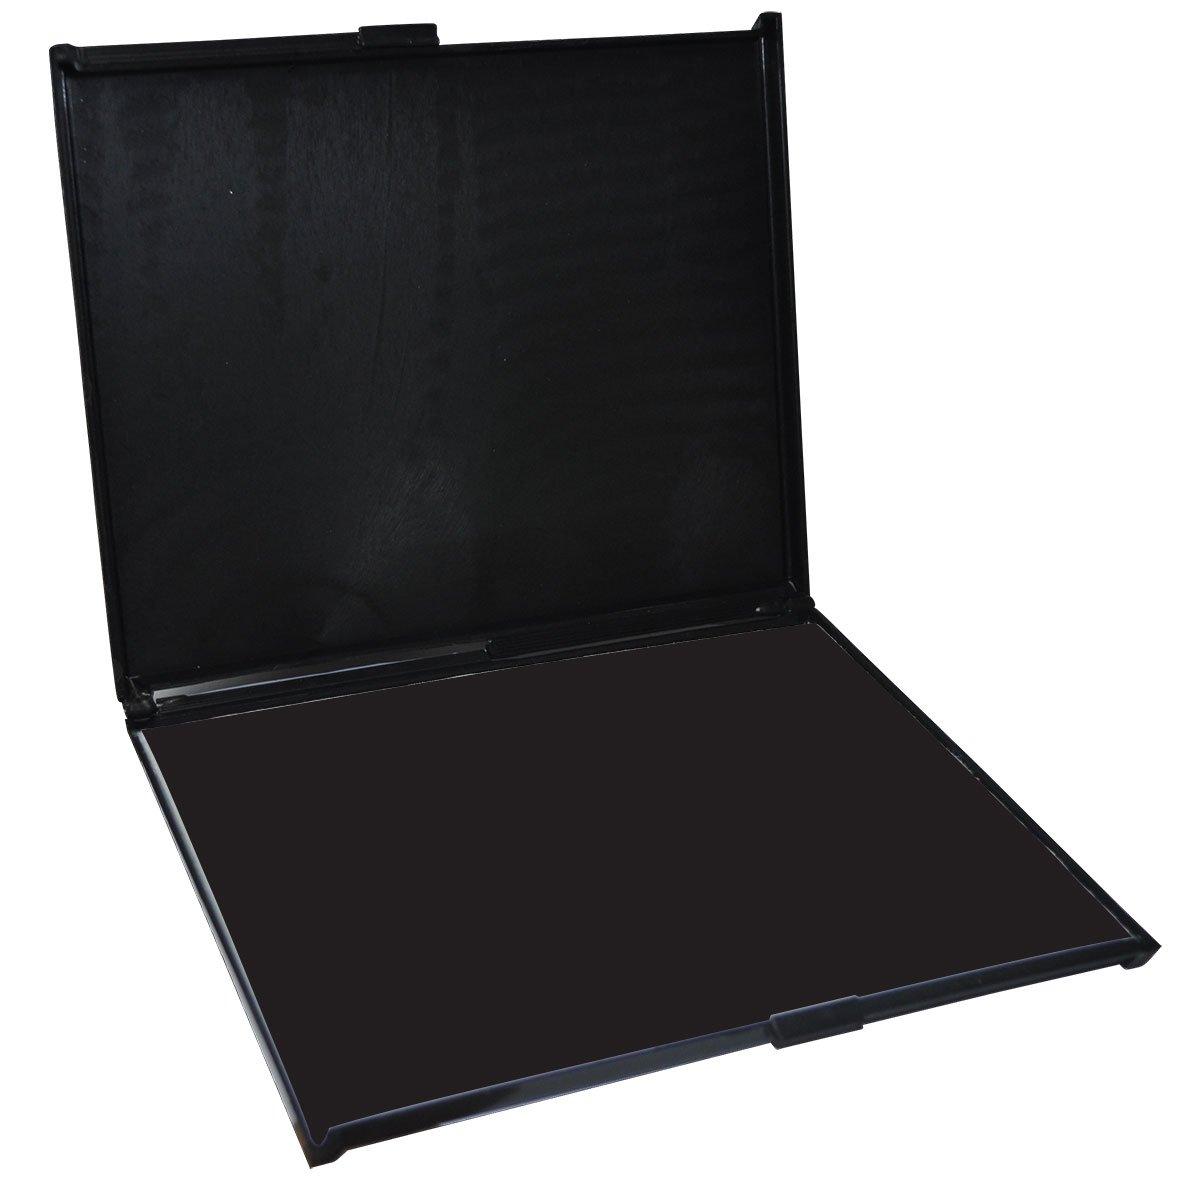 MaxMark Extra Large Industrial BLACK Stamp Pad - 6'' by 8'' - Premium Quality Felt Pad